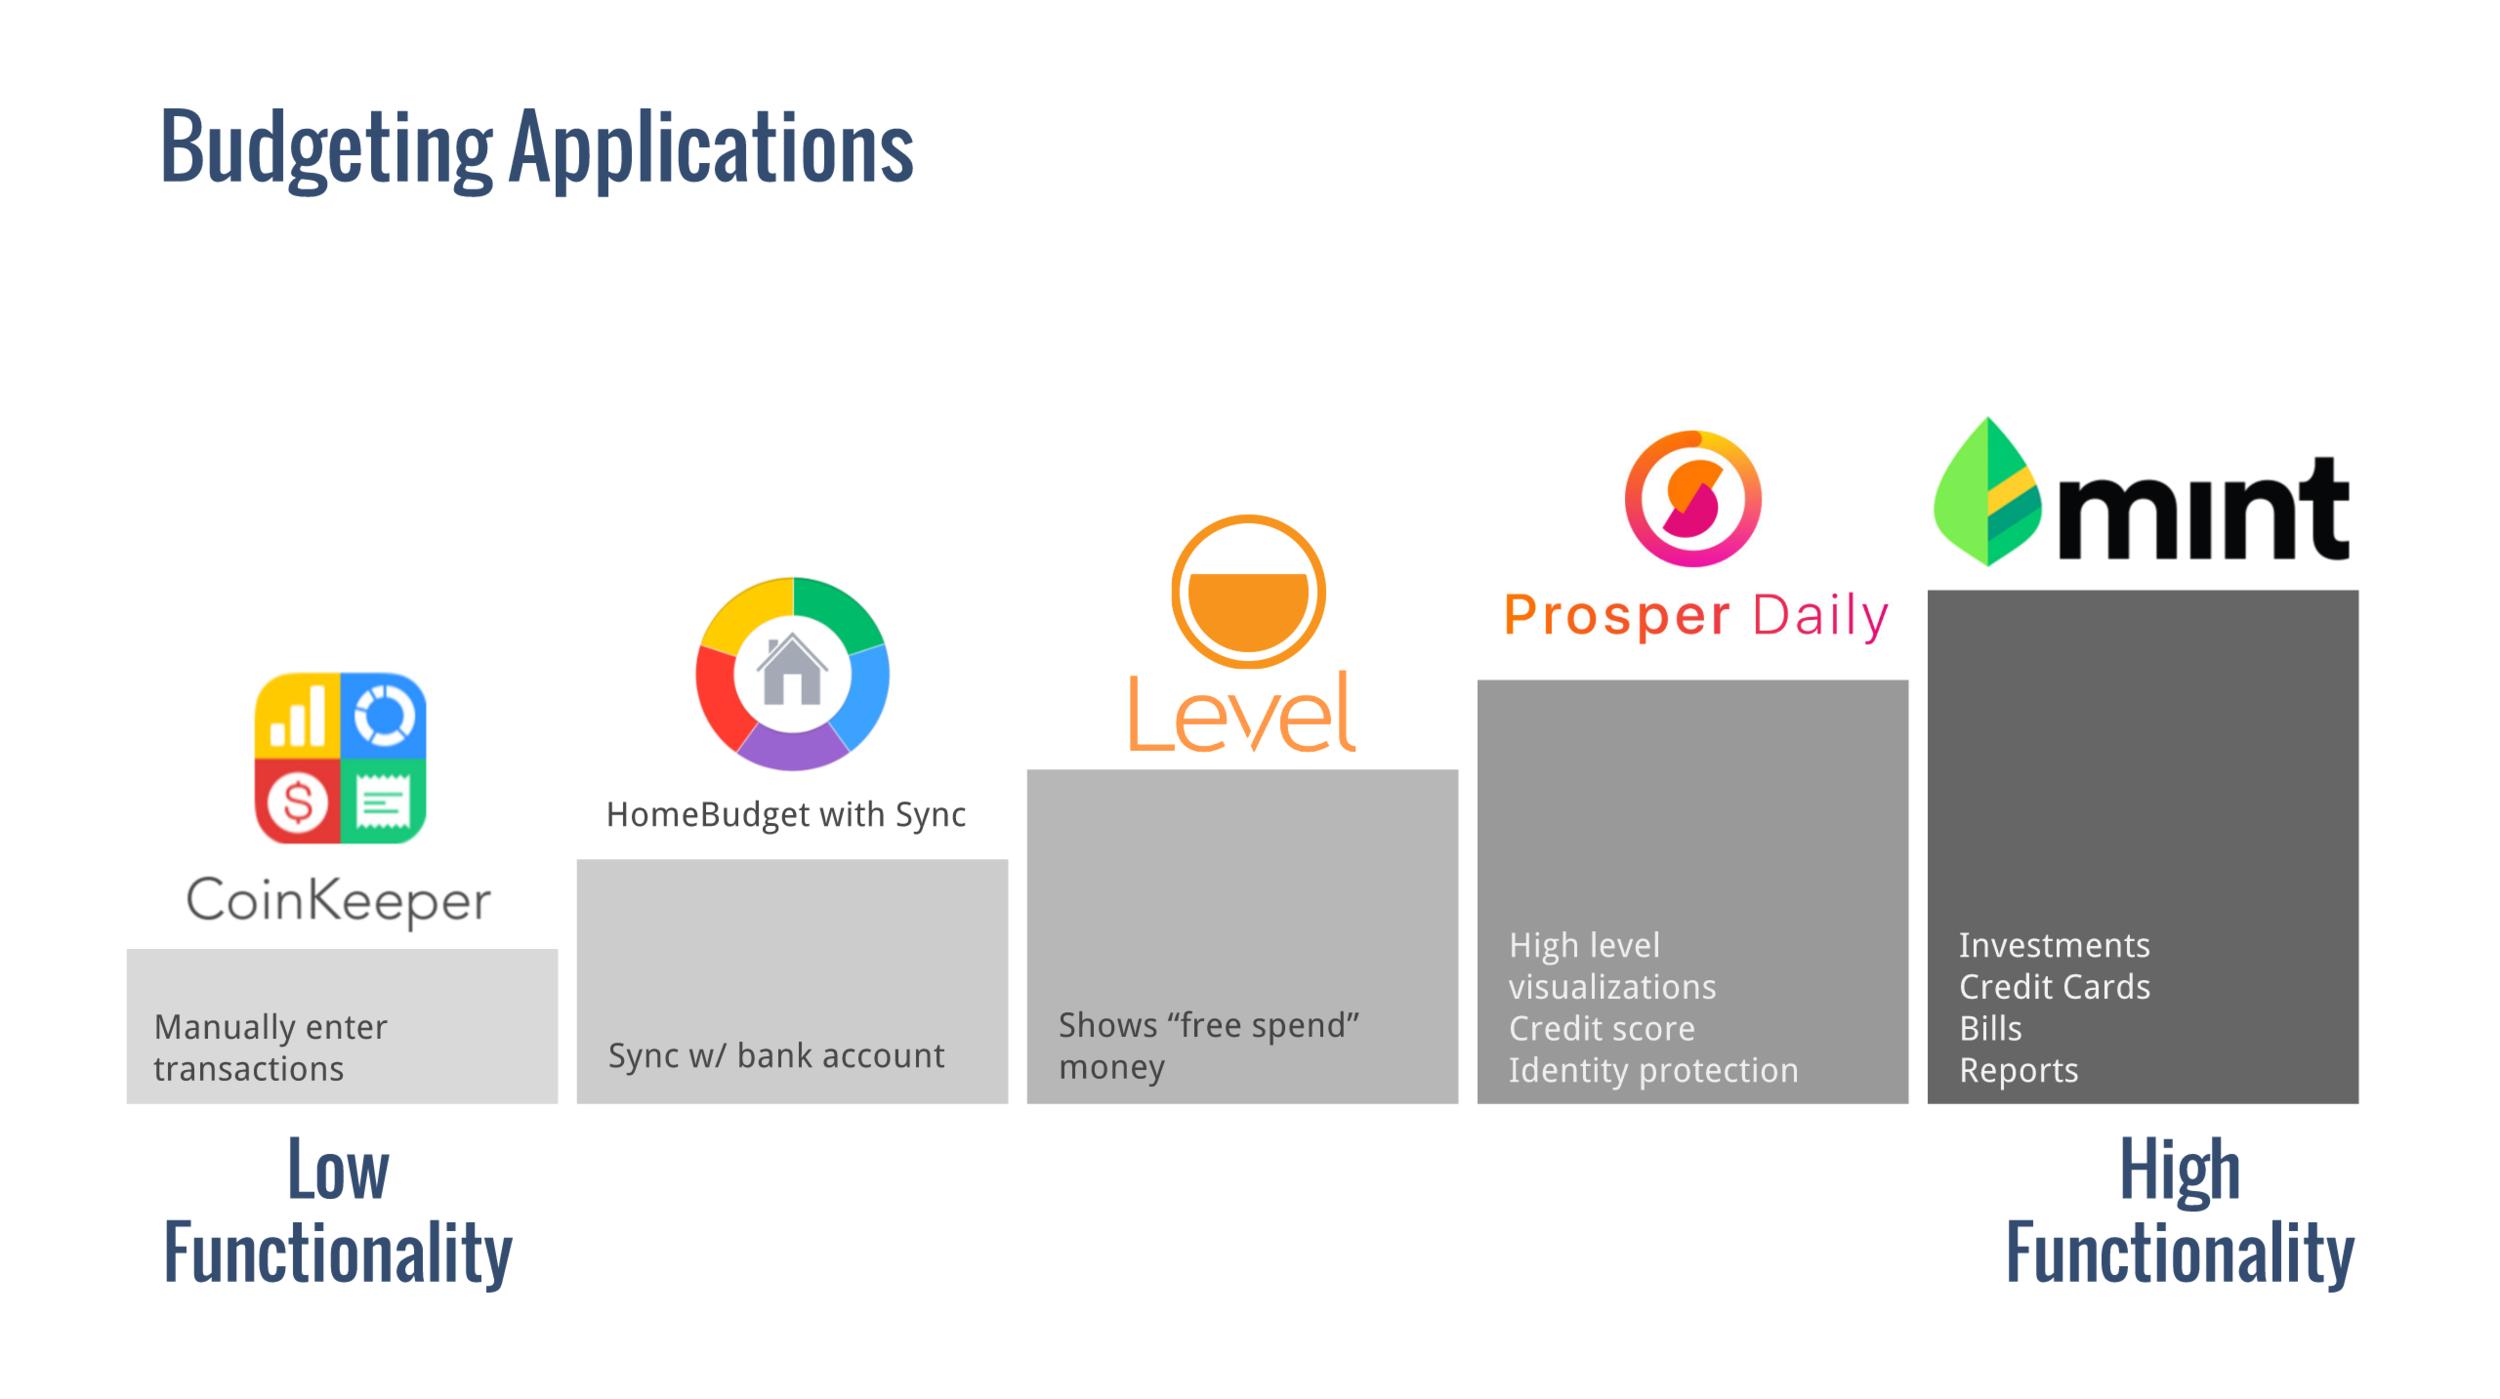 Budgeting apps analysis